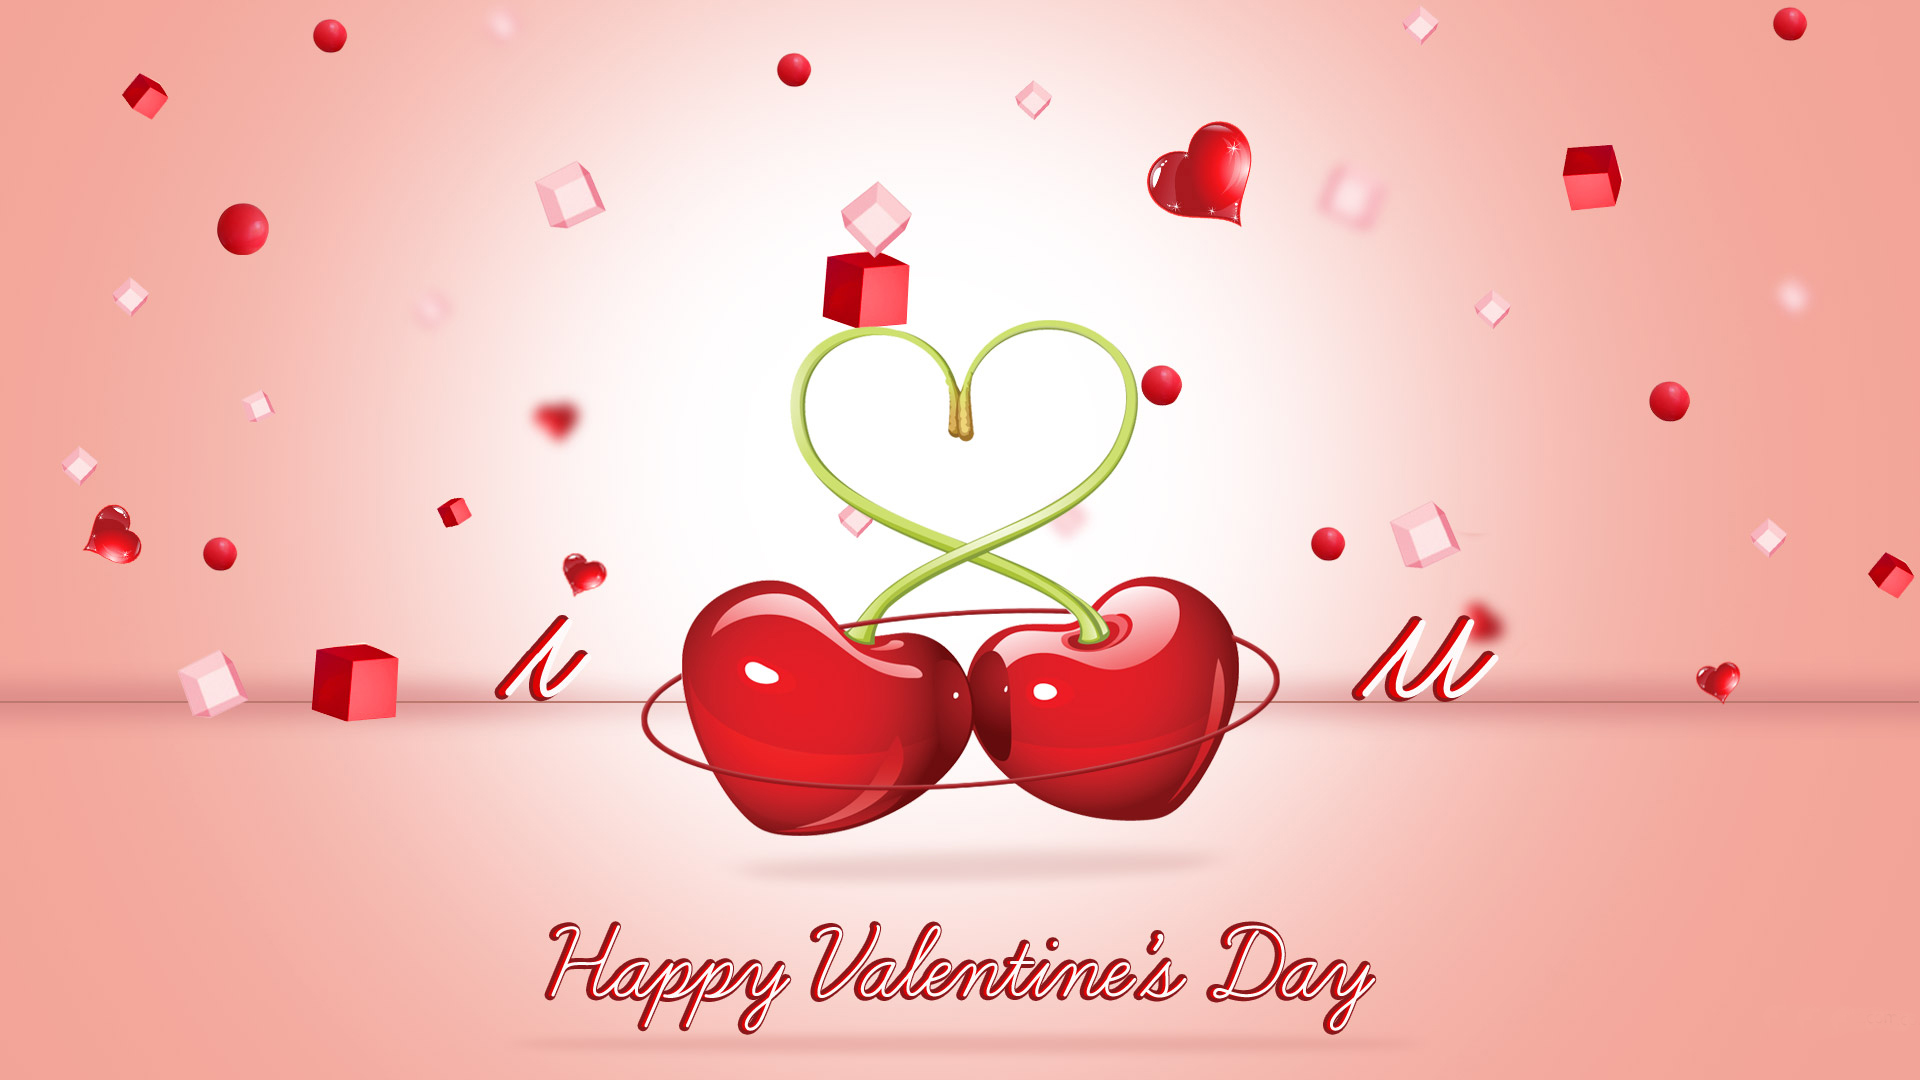 Happy Valentines Day Background Wallpaper